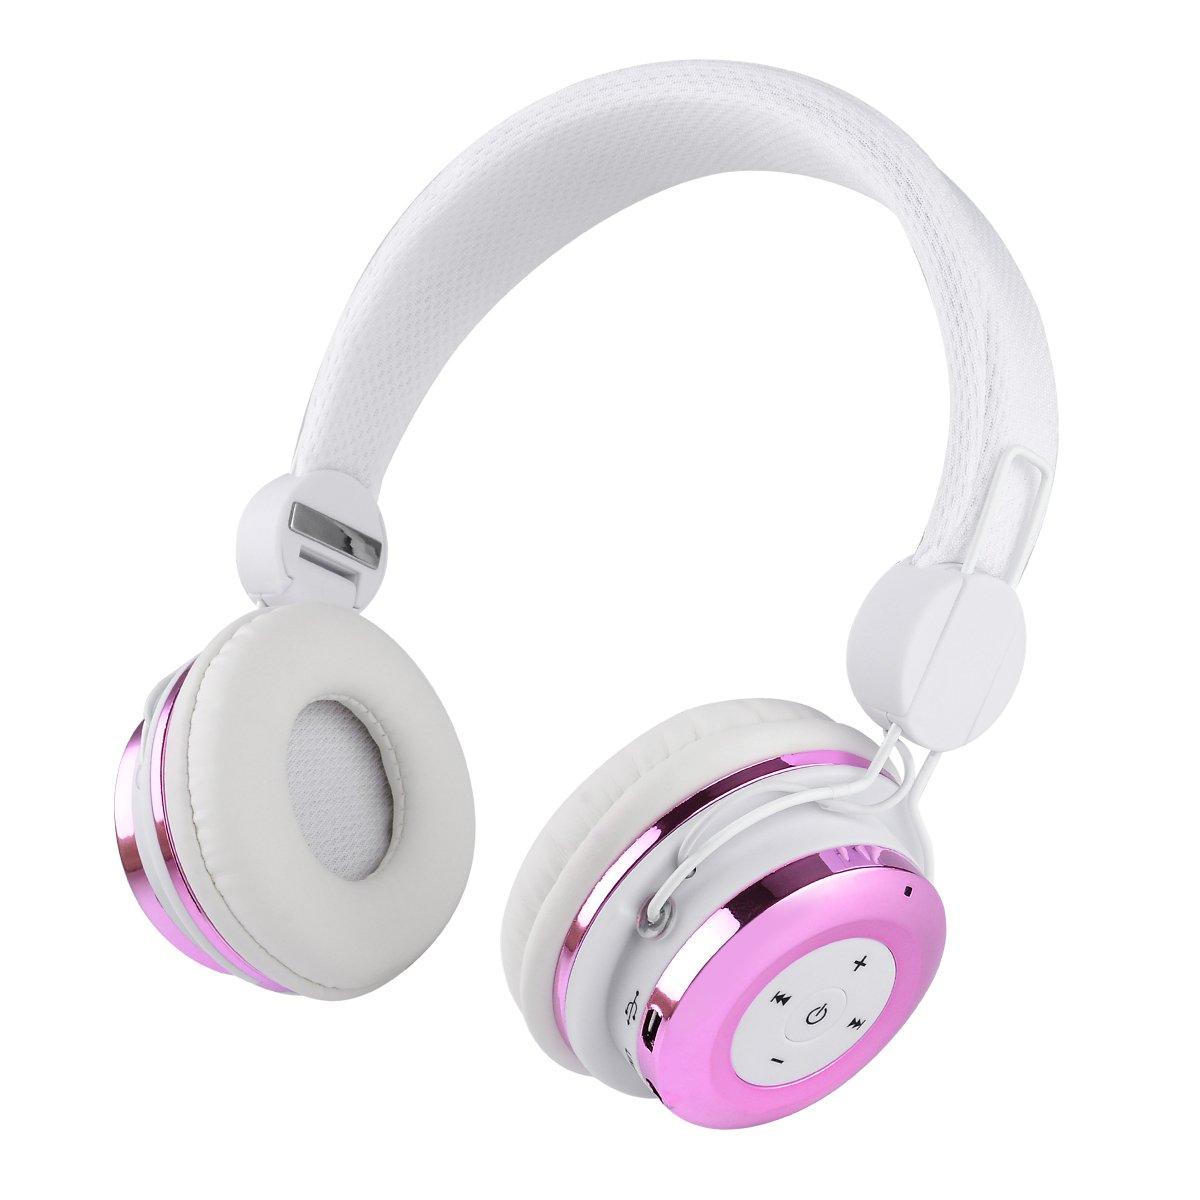 Auriculares Inalámbrico de Diadema Plegable Aita BT804 Bluetooth ...